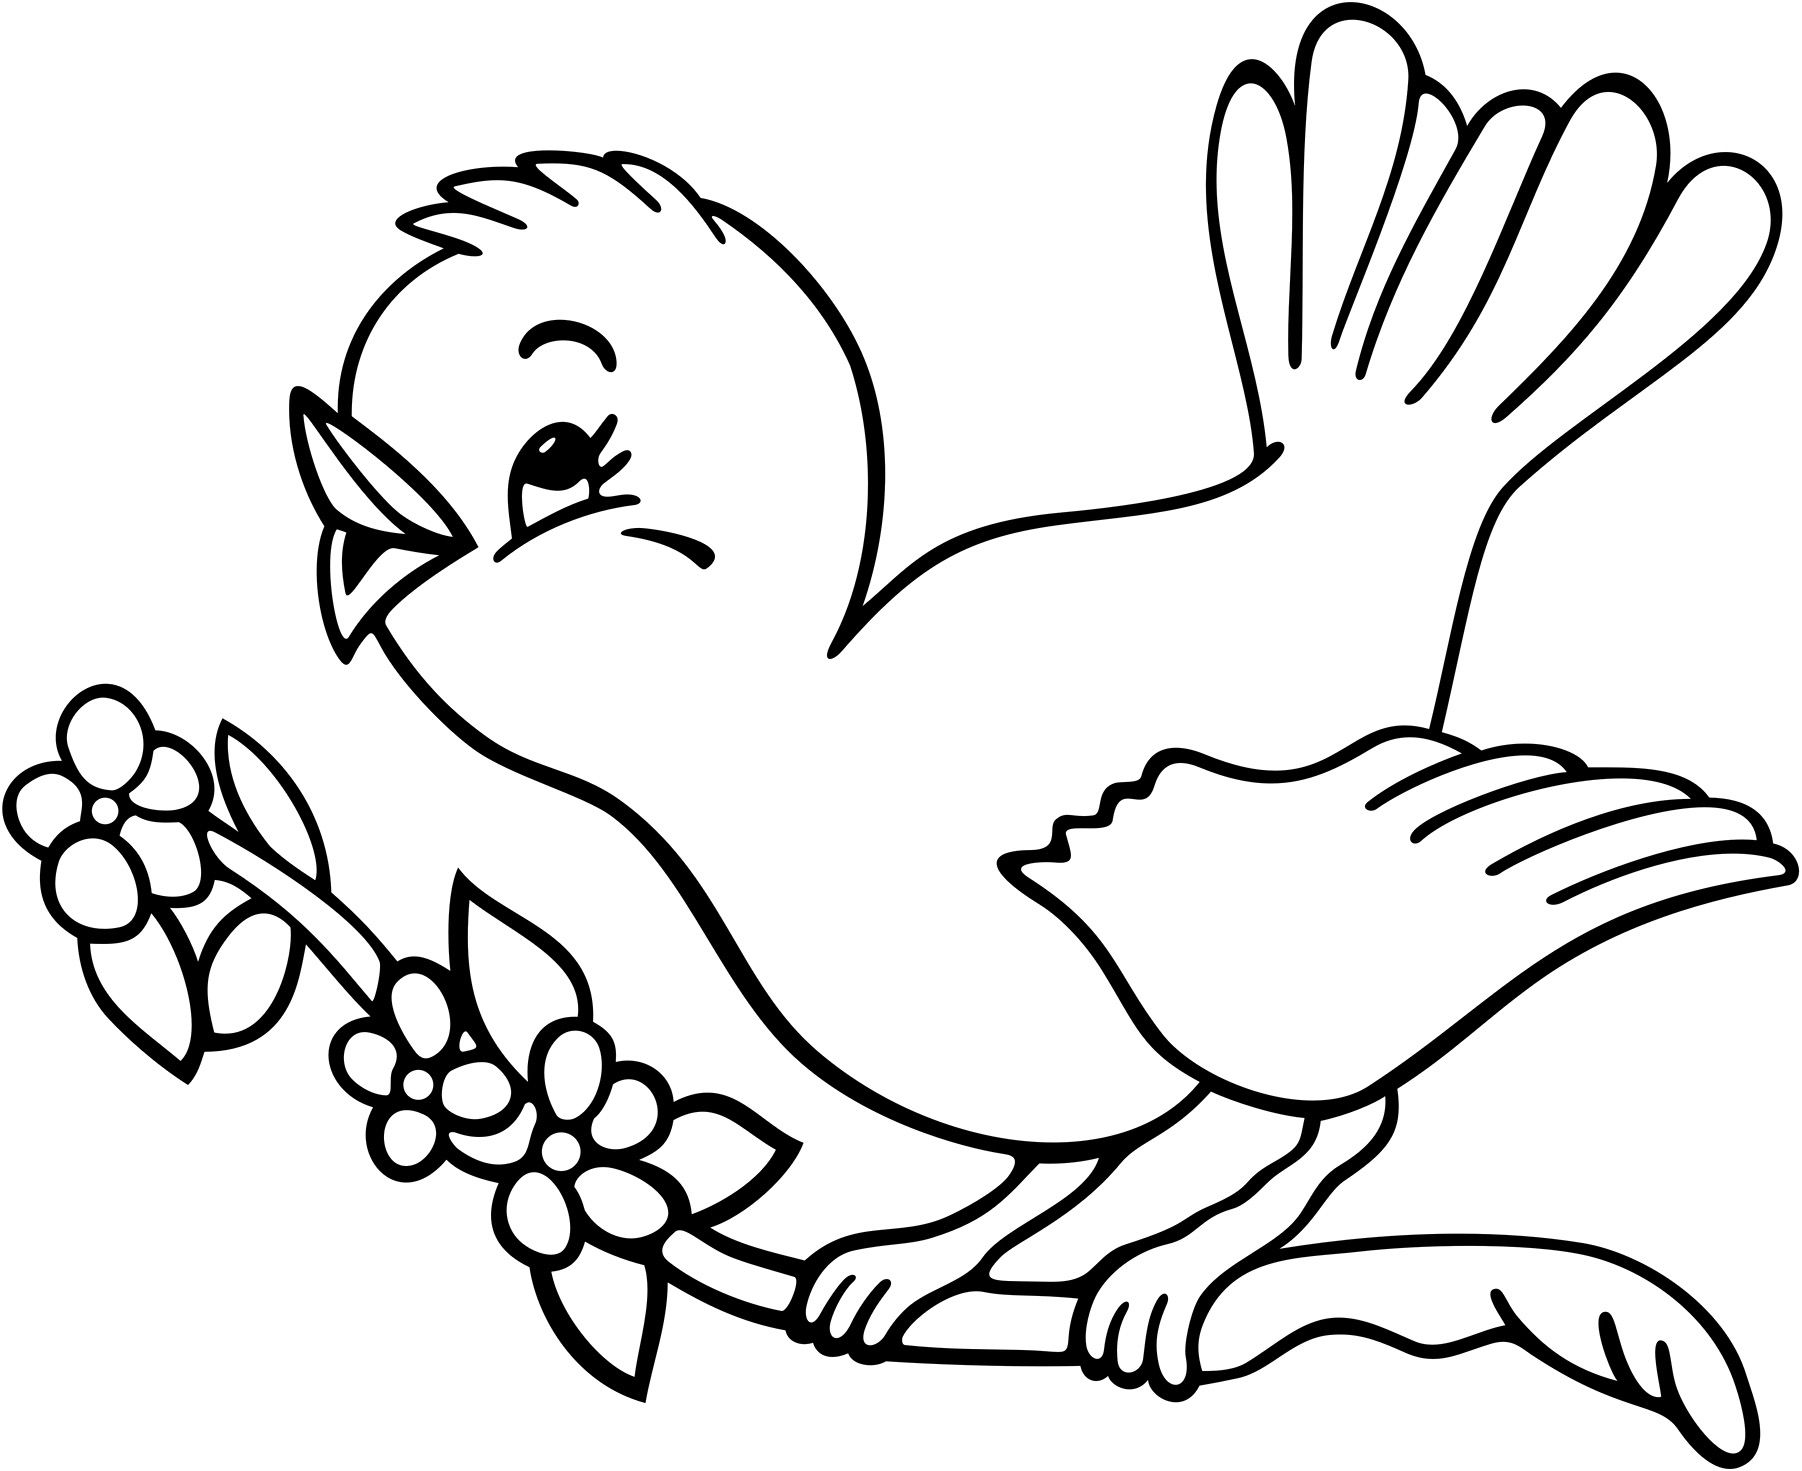 Birds clipart coloring. Https www google com